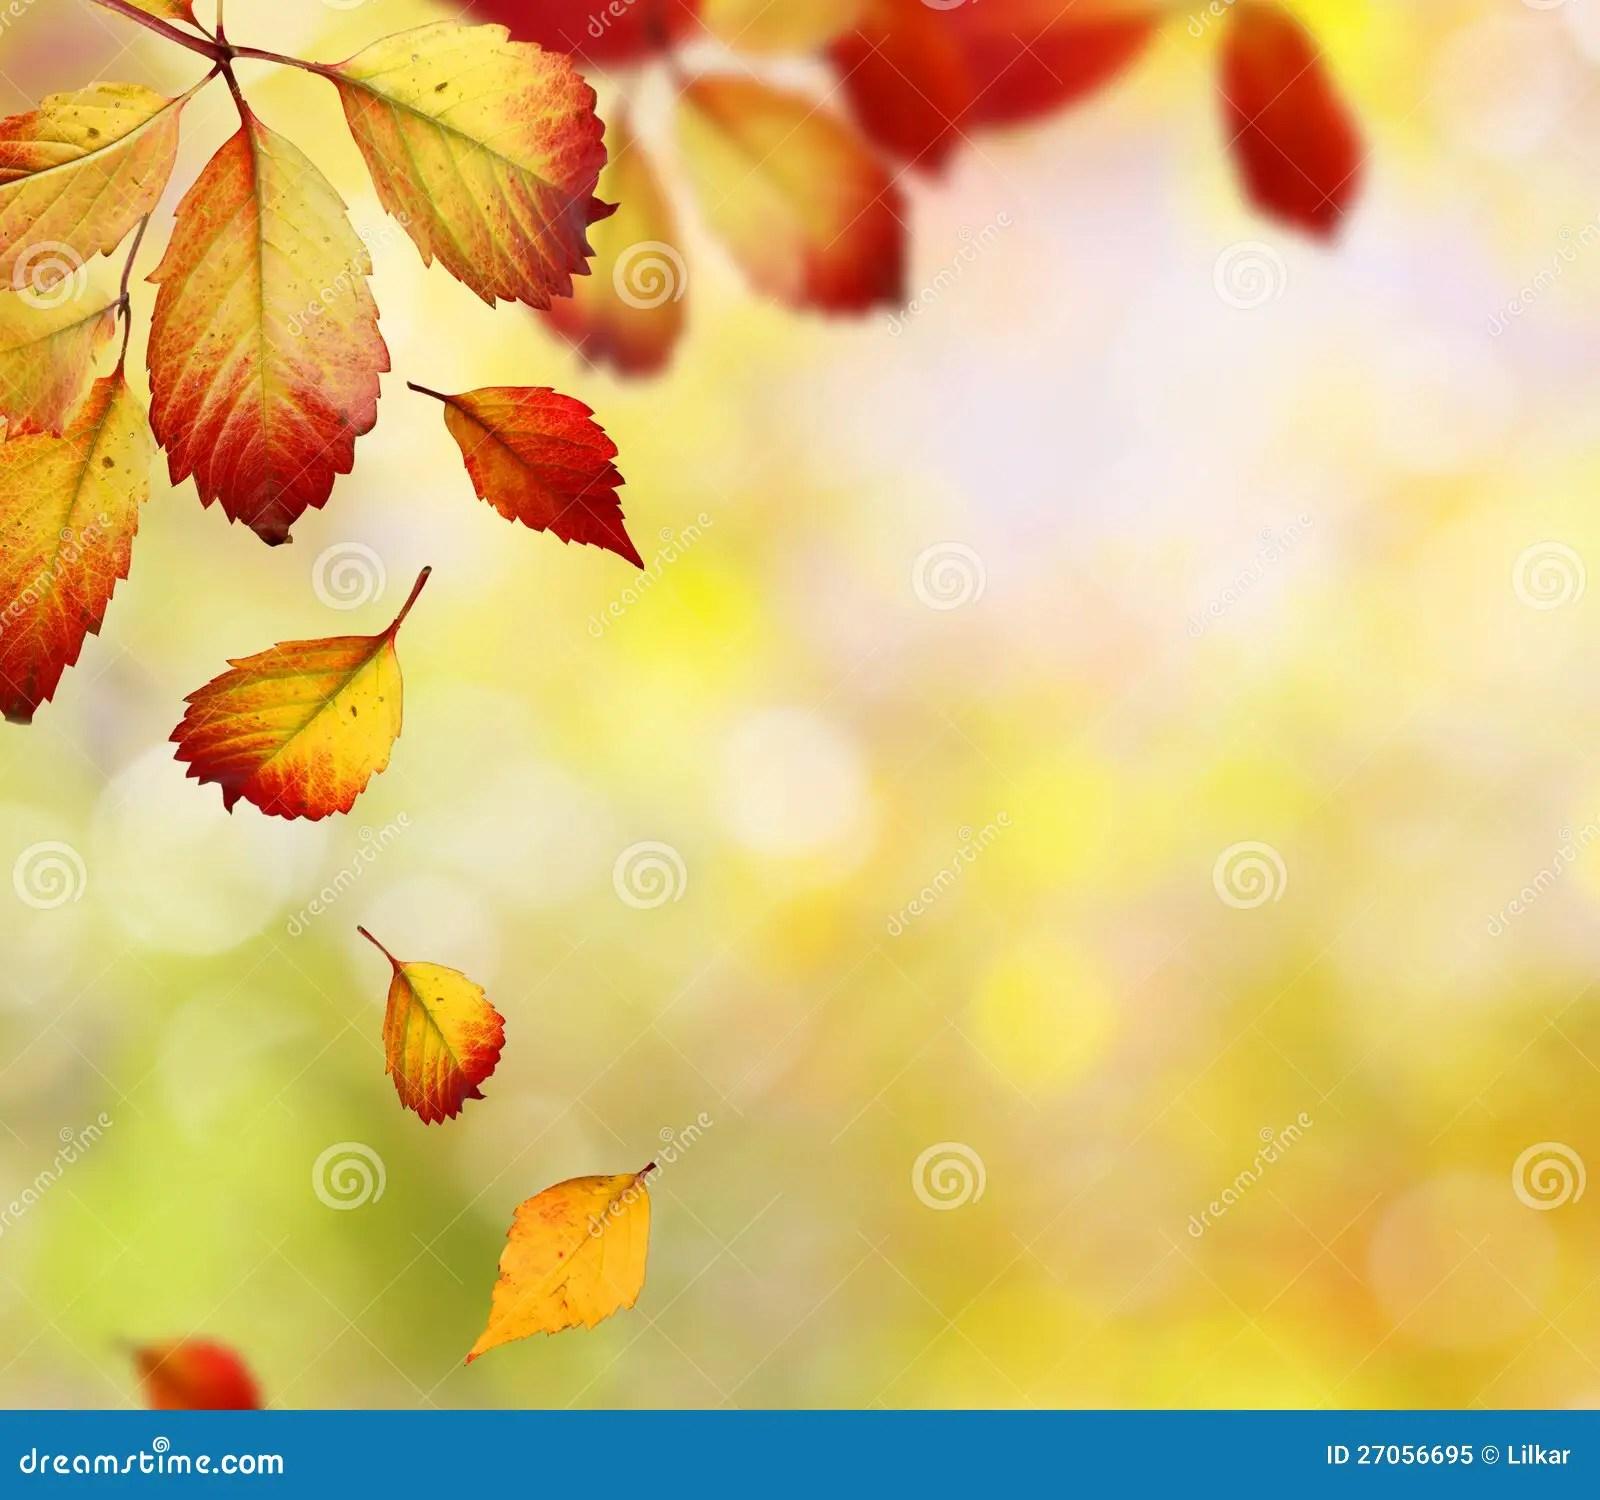 Maple Leaf Wallpaper For Fall Season Falling Autumn Leaves Stock Image Image Of Autumn Fall